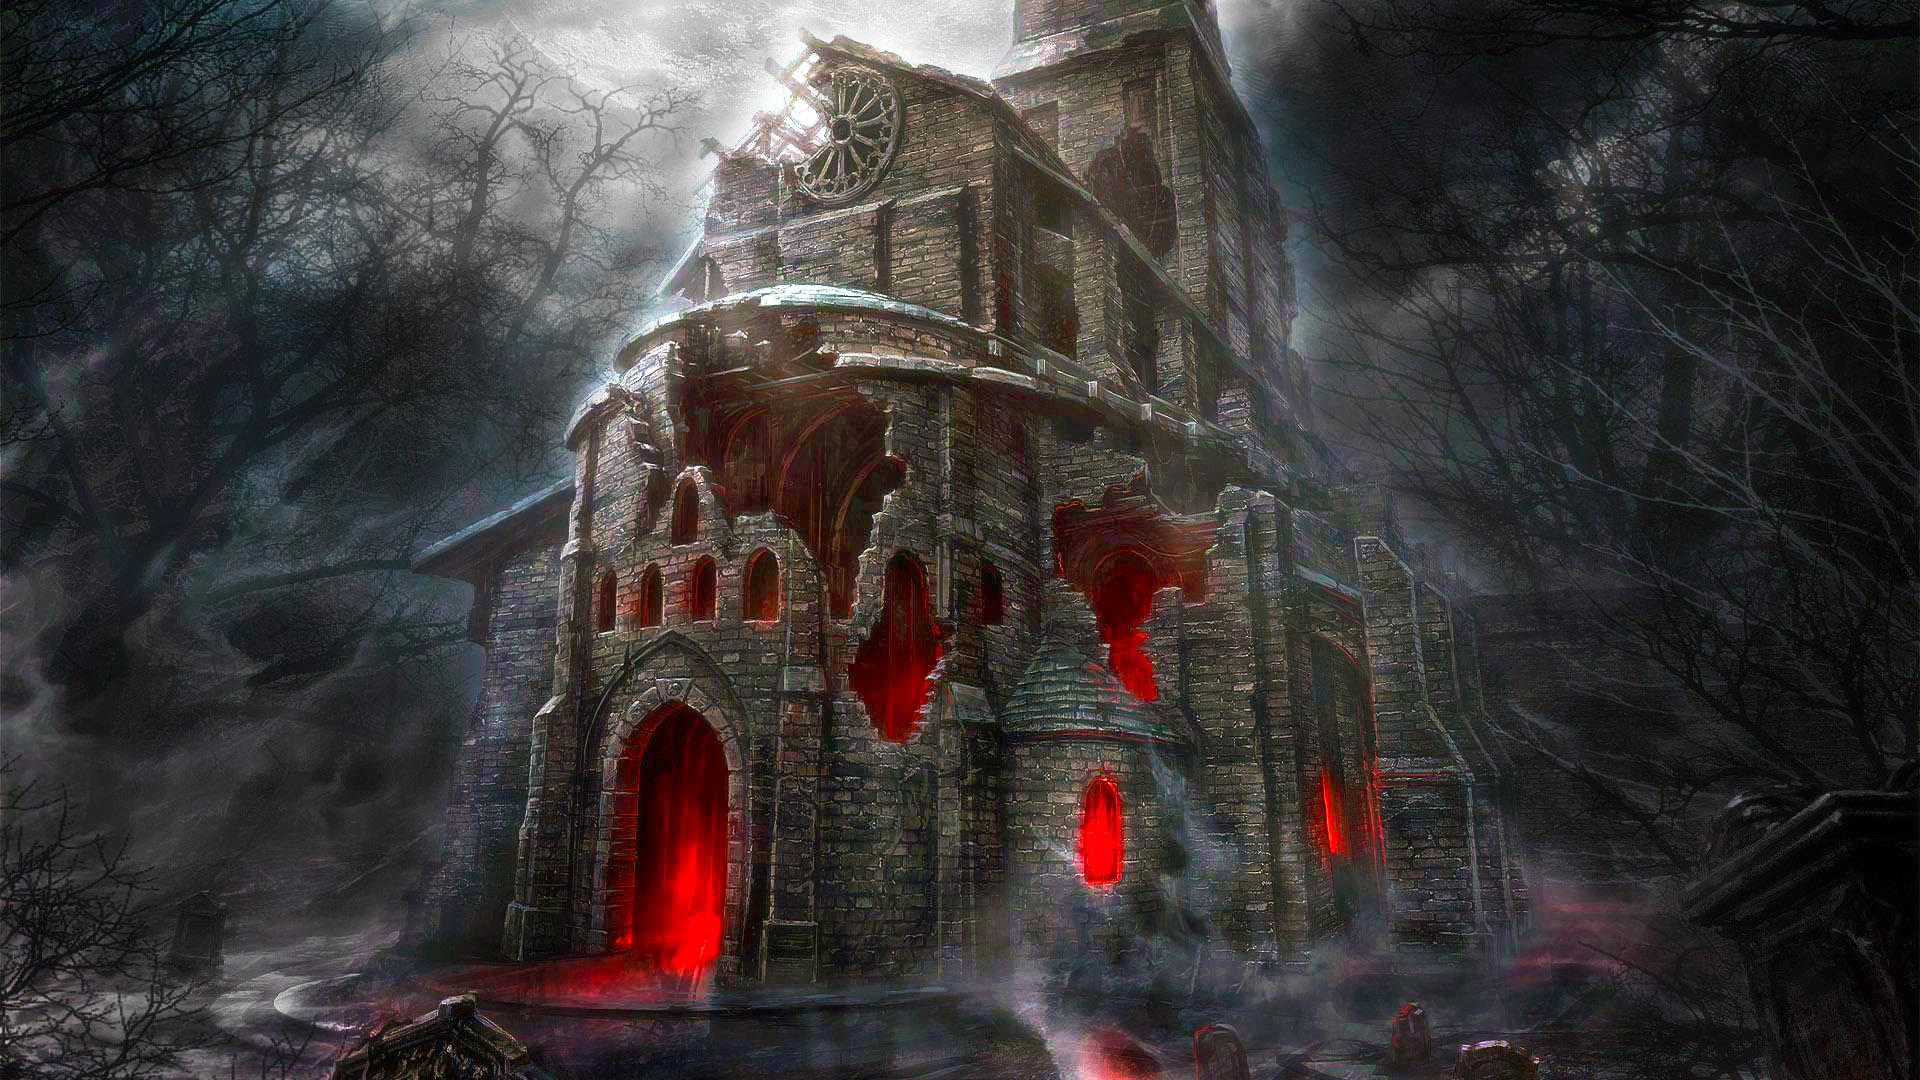 Hd wallpaper horror - Halloween Horror House Hd Wallpaper Stylish Wallpapers